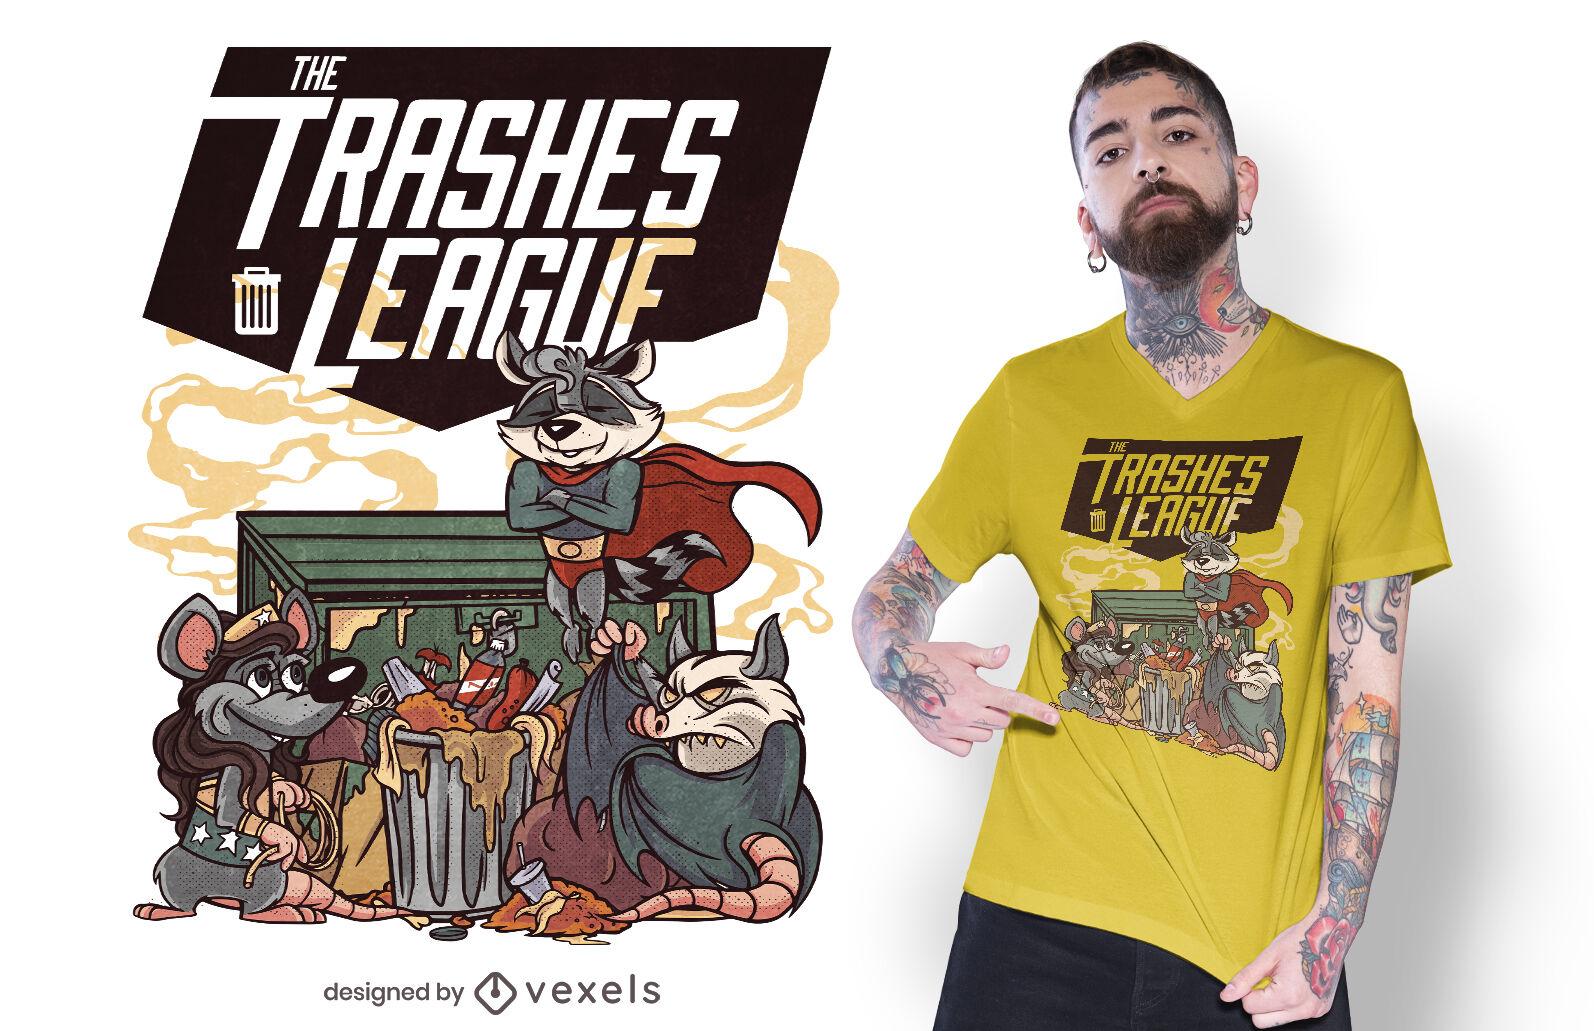 The trashes league t-shirt design